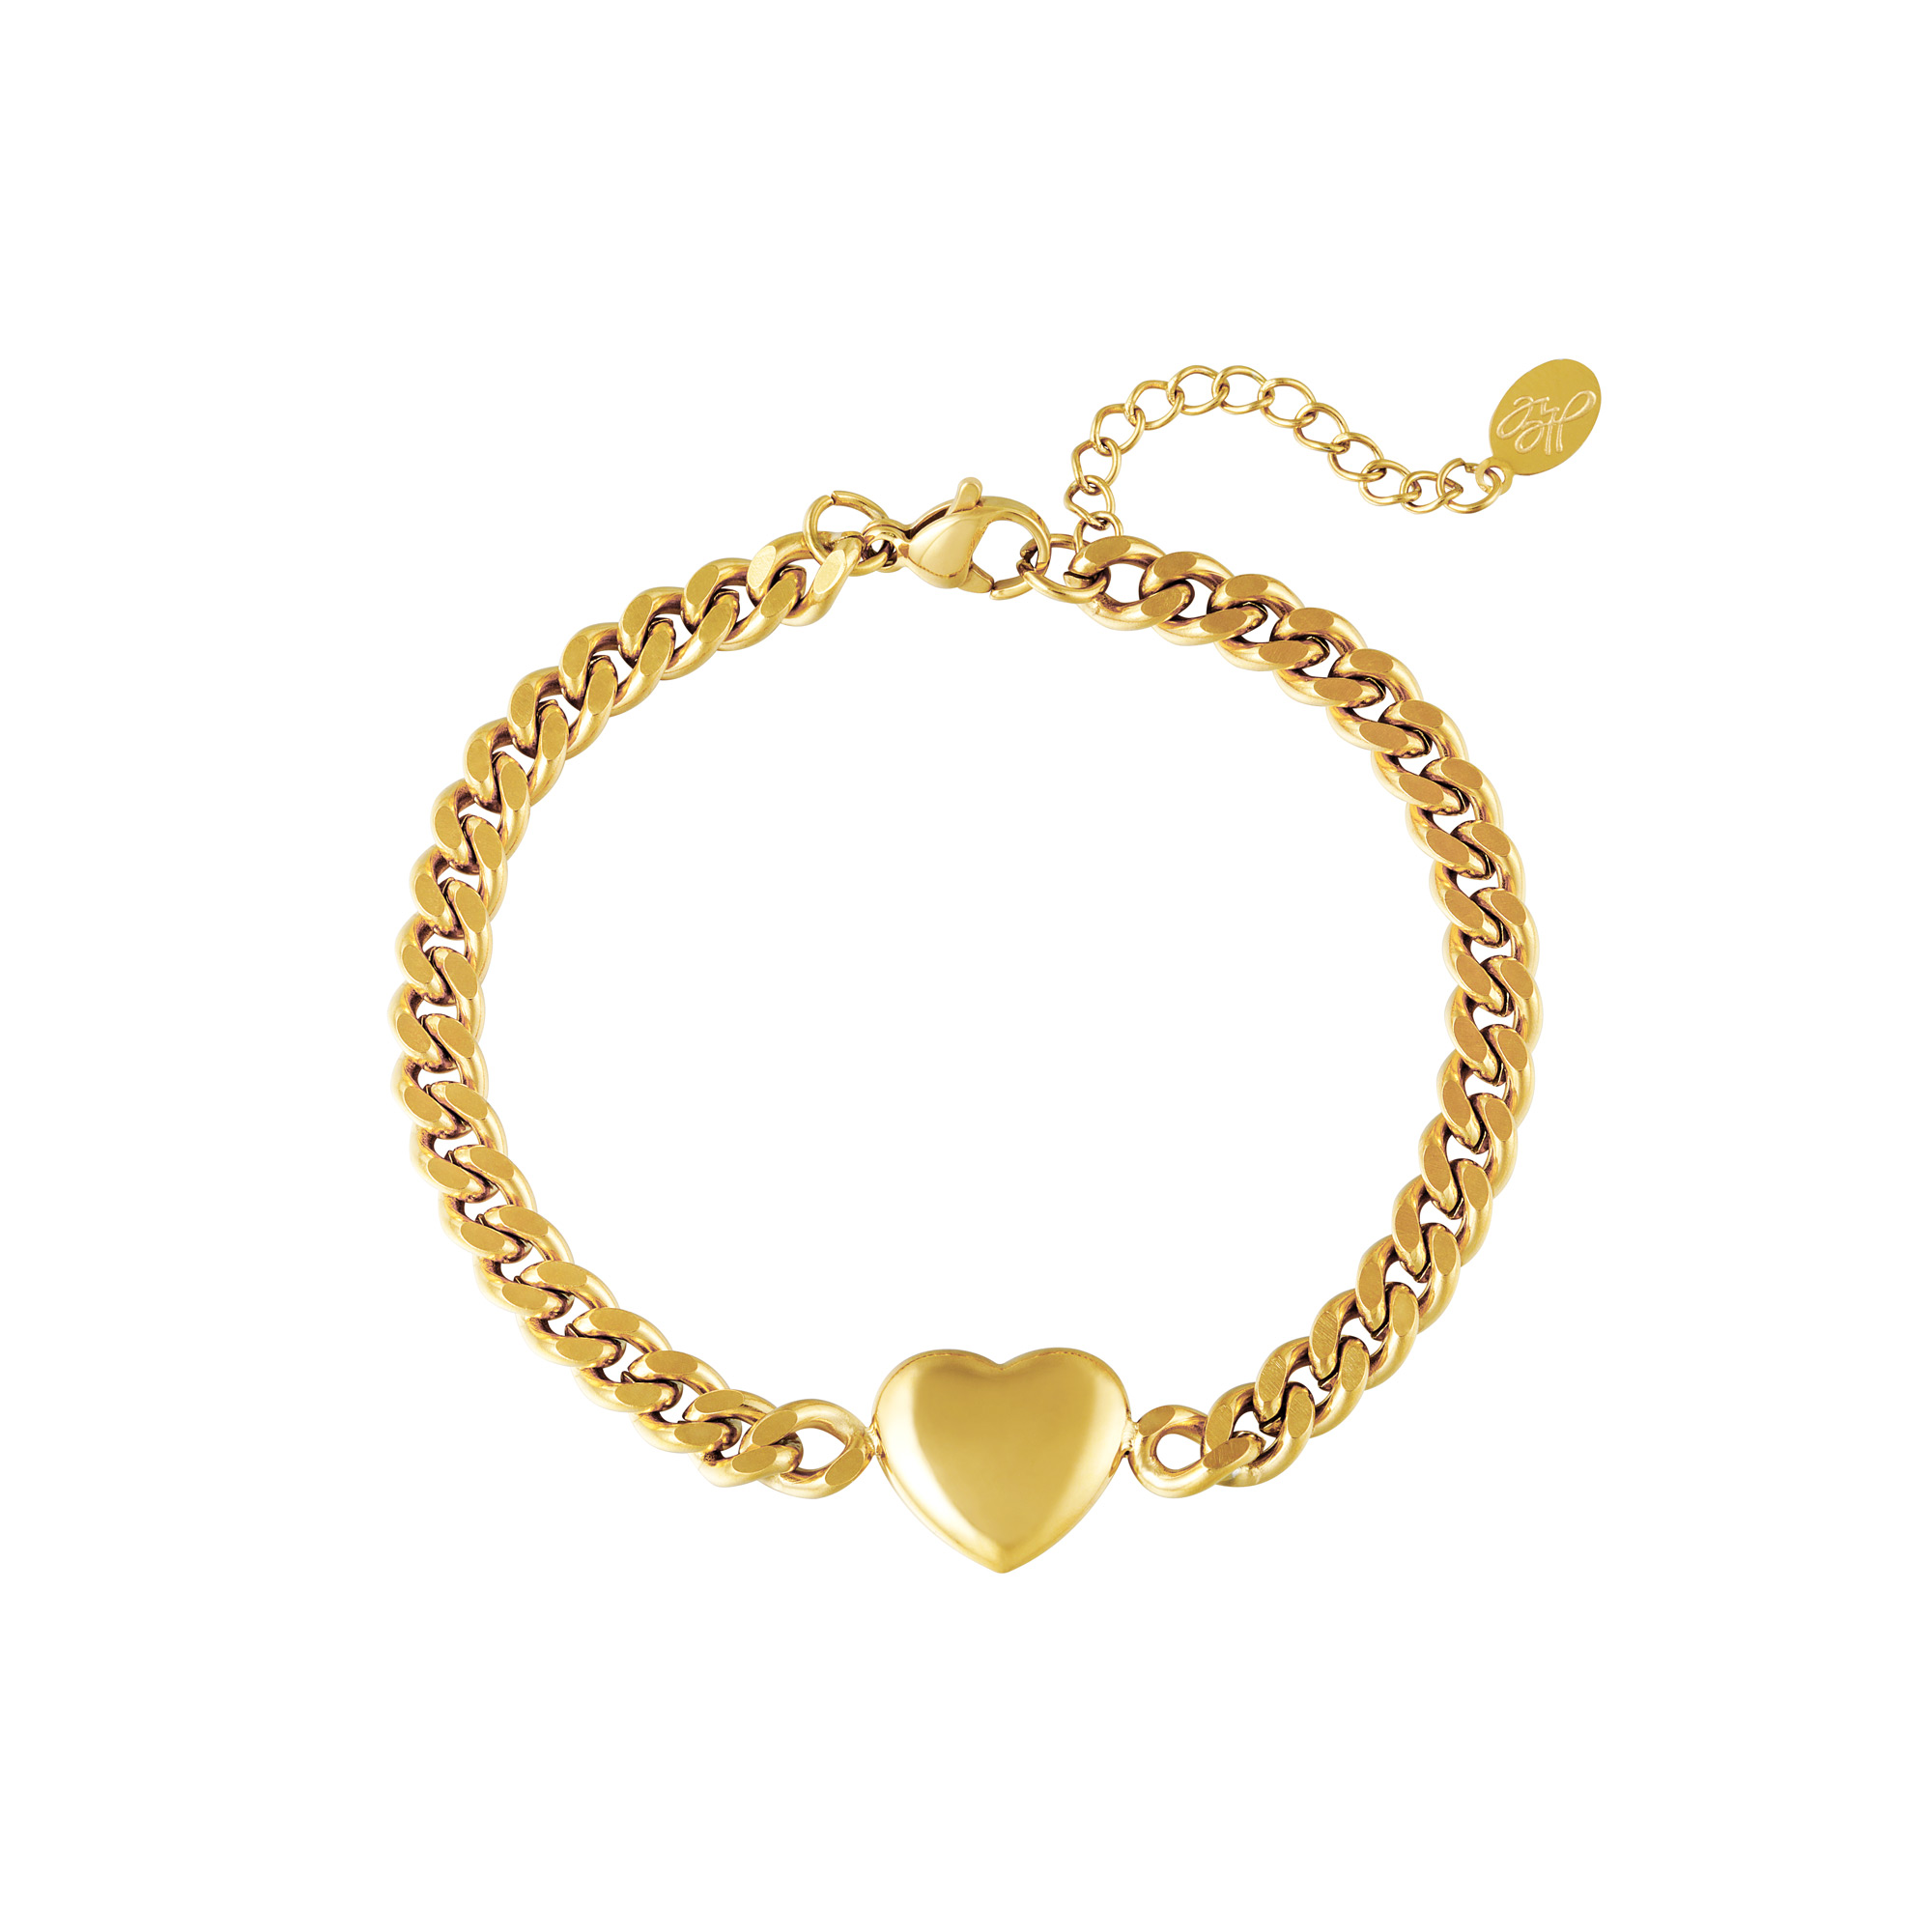 Bracelet Chained Heart